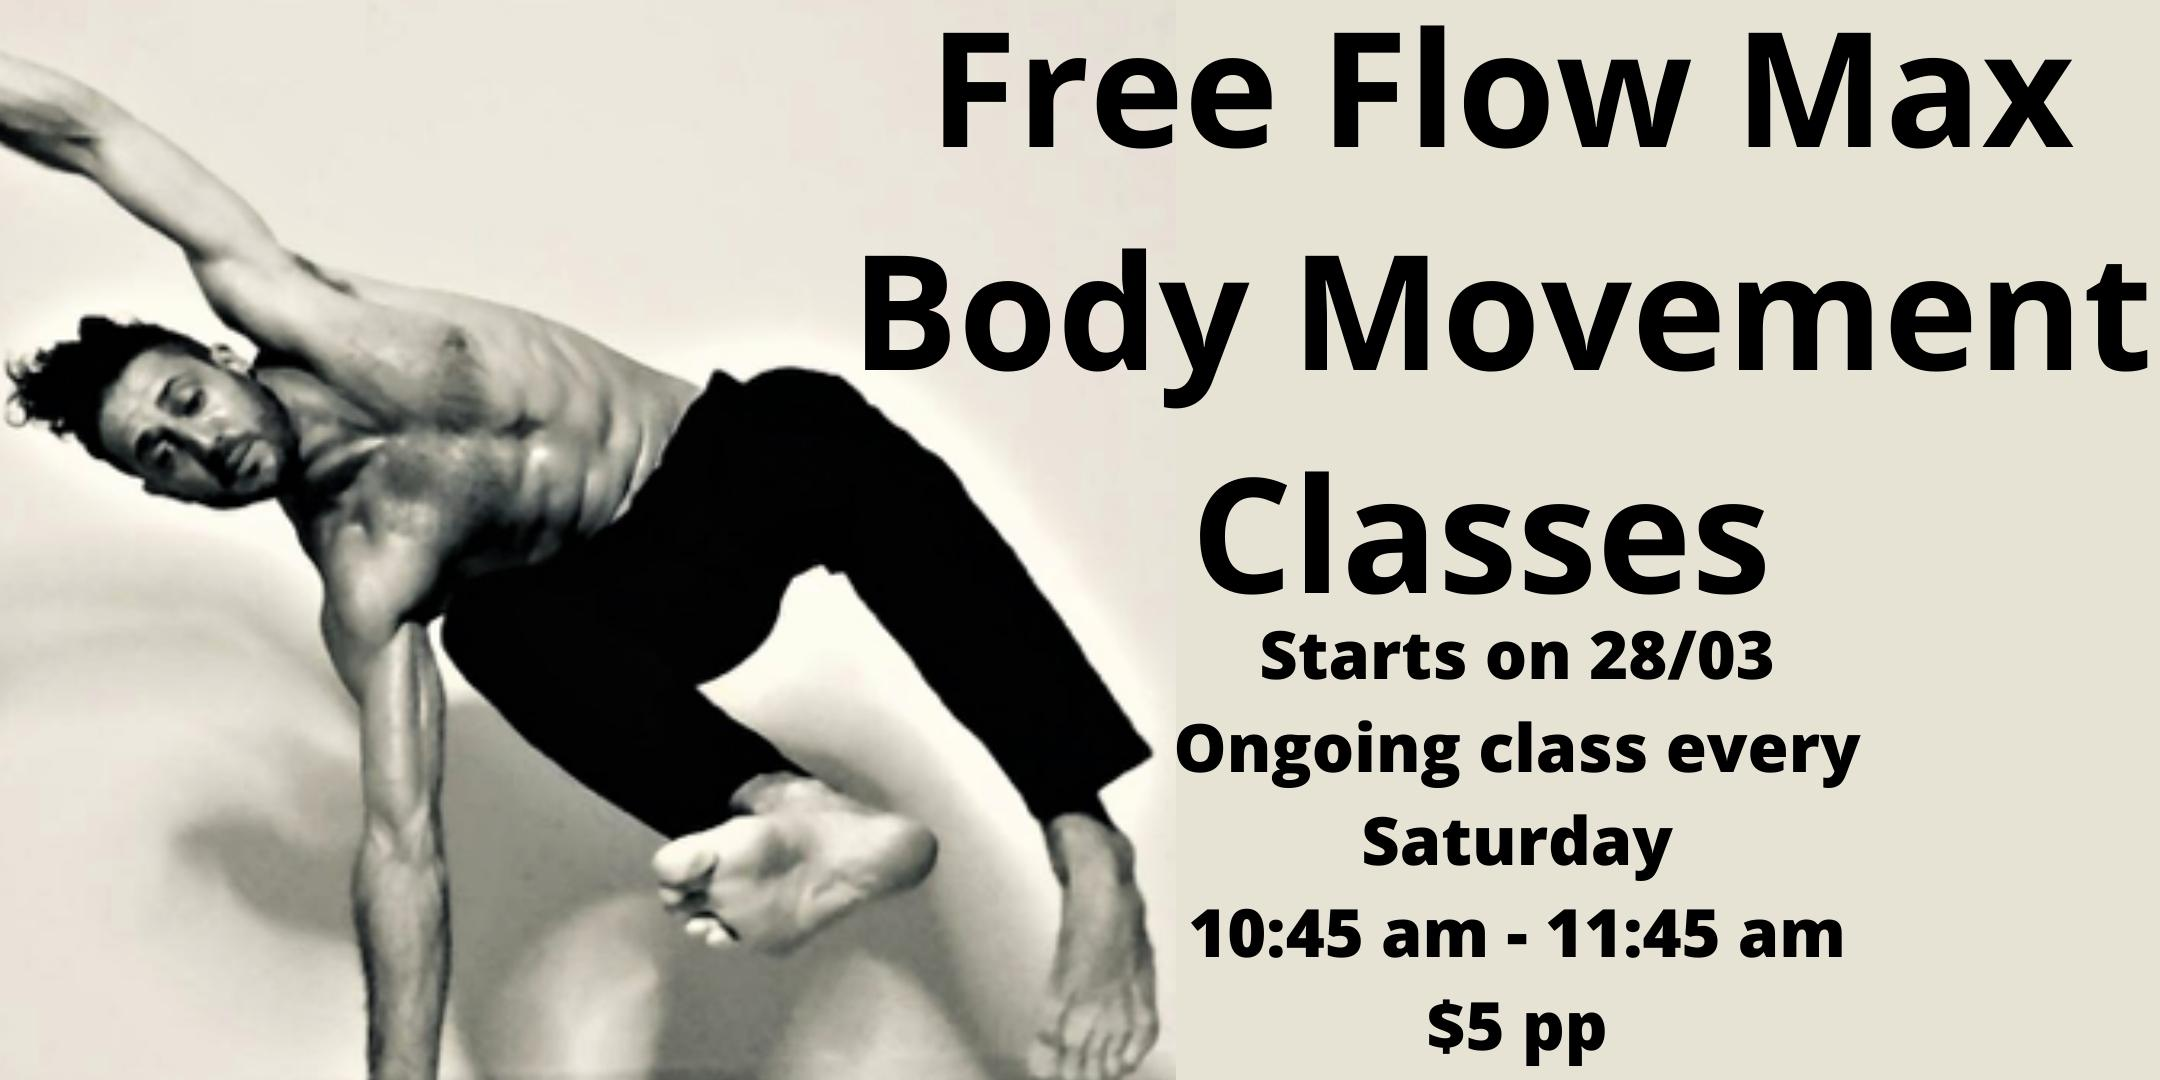 Free Flow Max Body Movement Classes